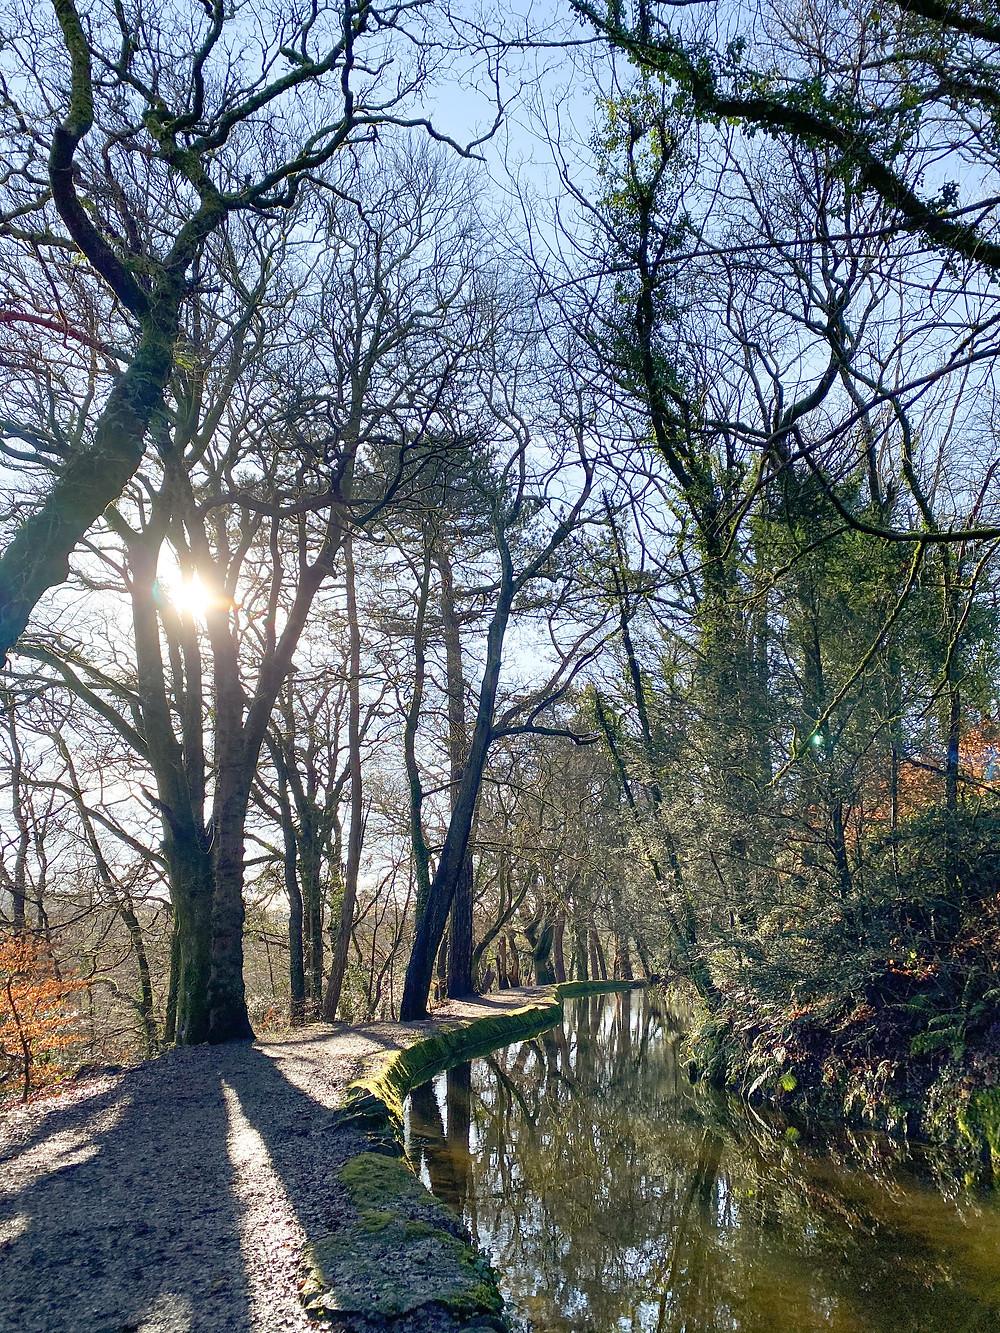 Tavistock Canal on a sunny, winter's day.